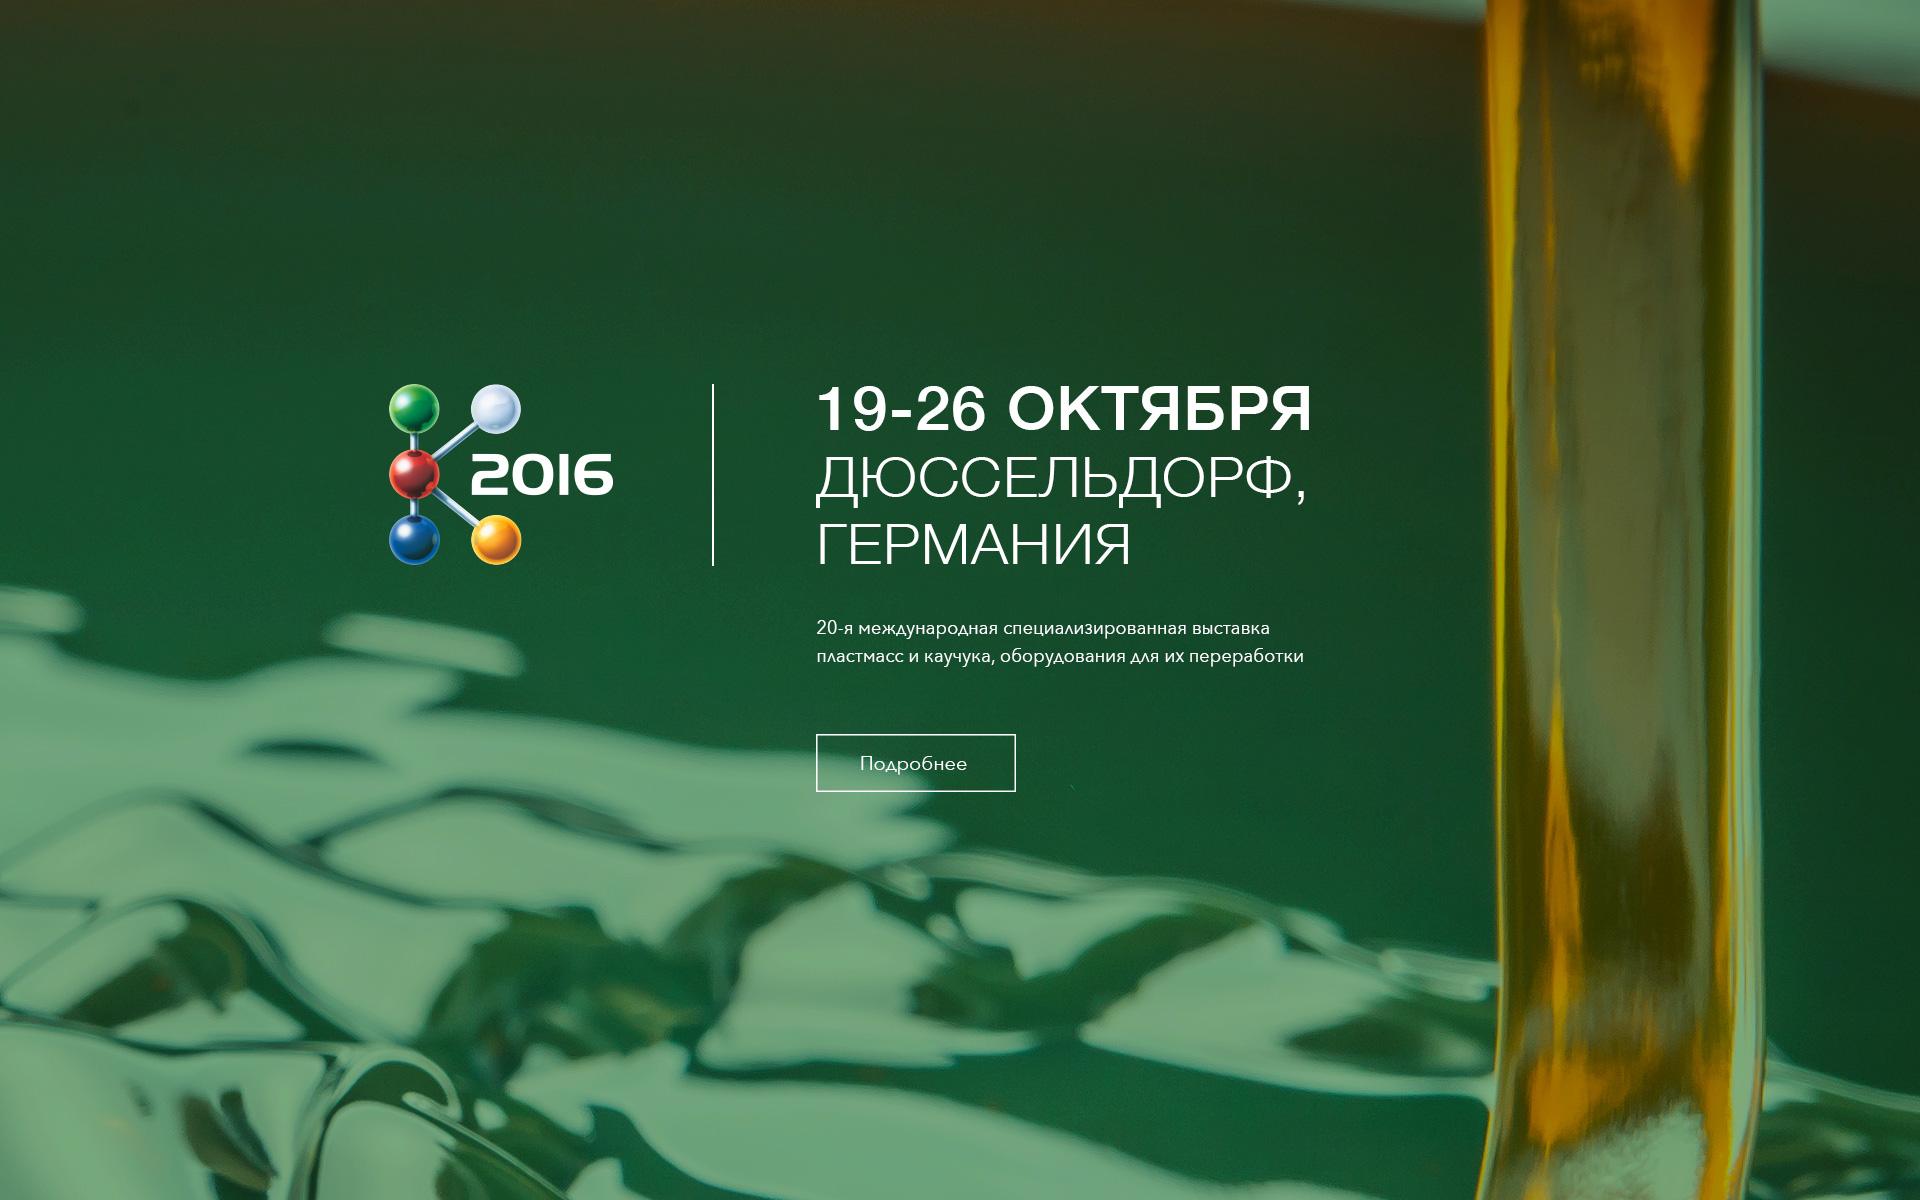 K-2016_wide_banner_rus